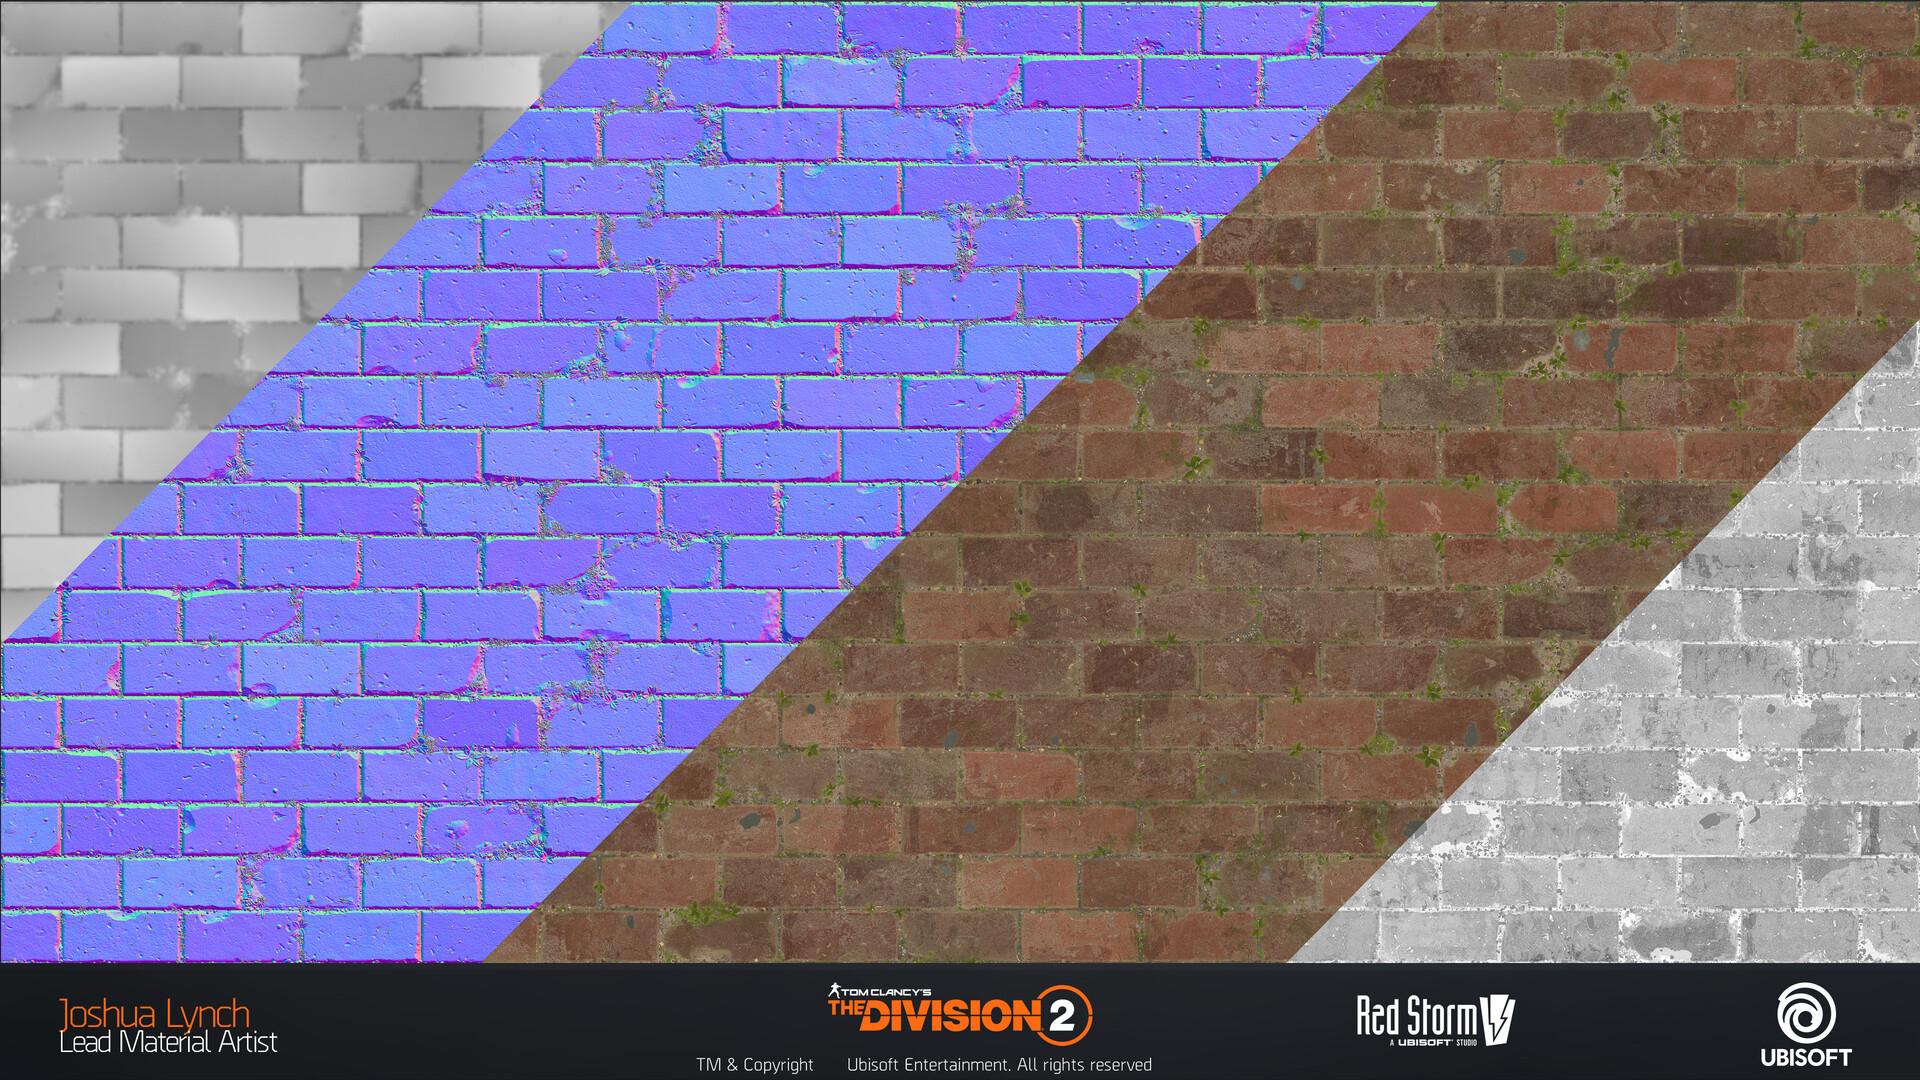 Joshua lynch division 2 josh lynch brick flats